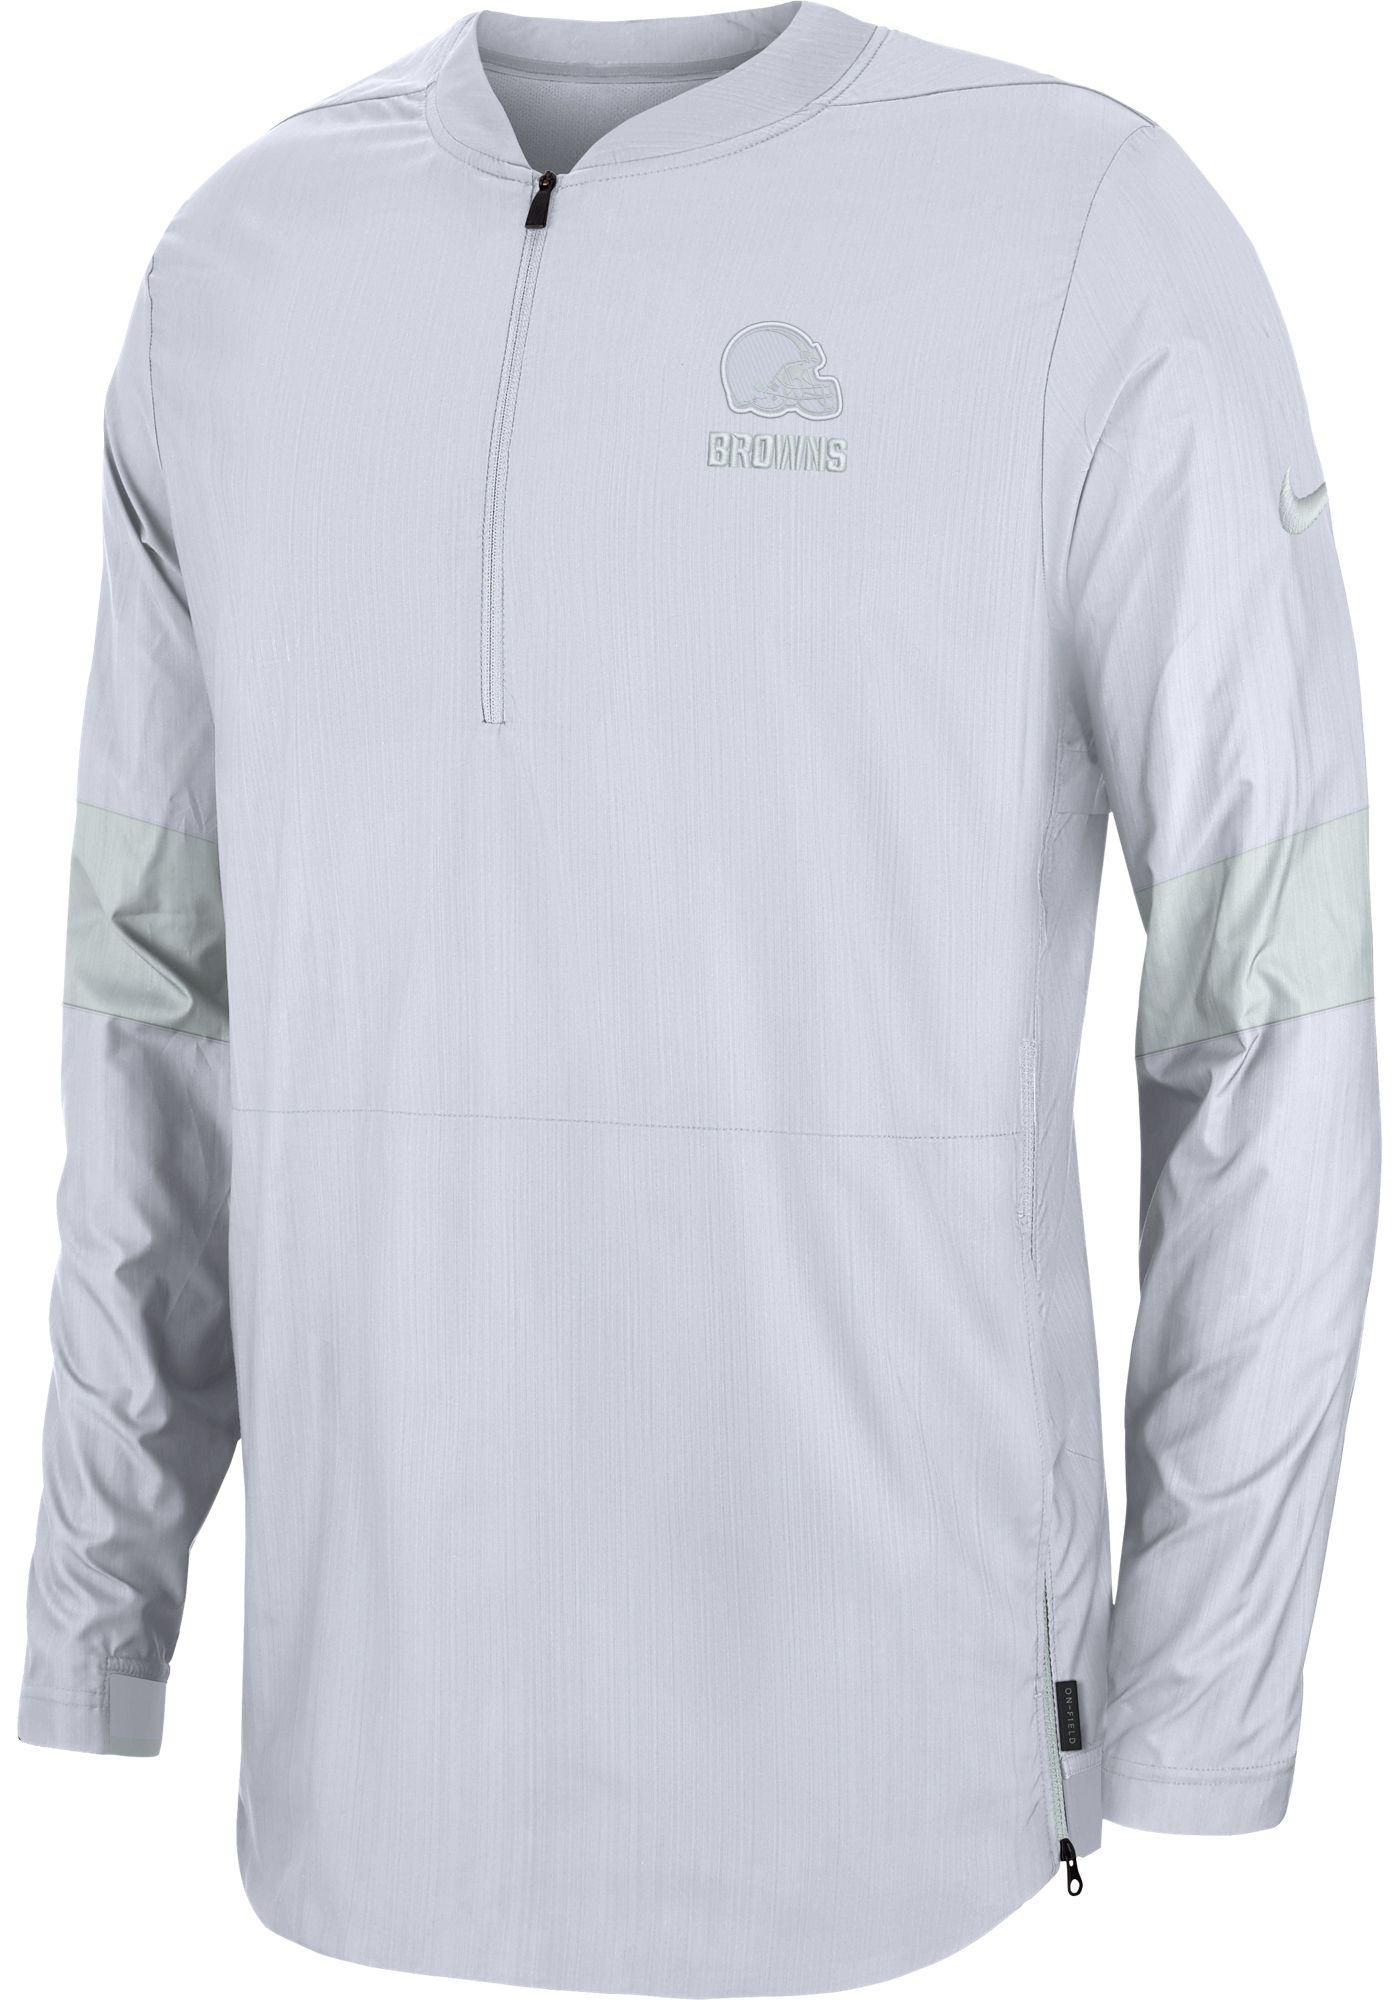 Nike Men's Cleveland Browns Sideline Coach White Half-Zip Performance Jacket